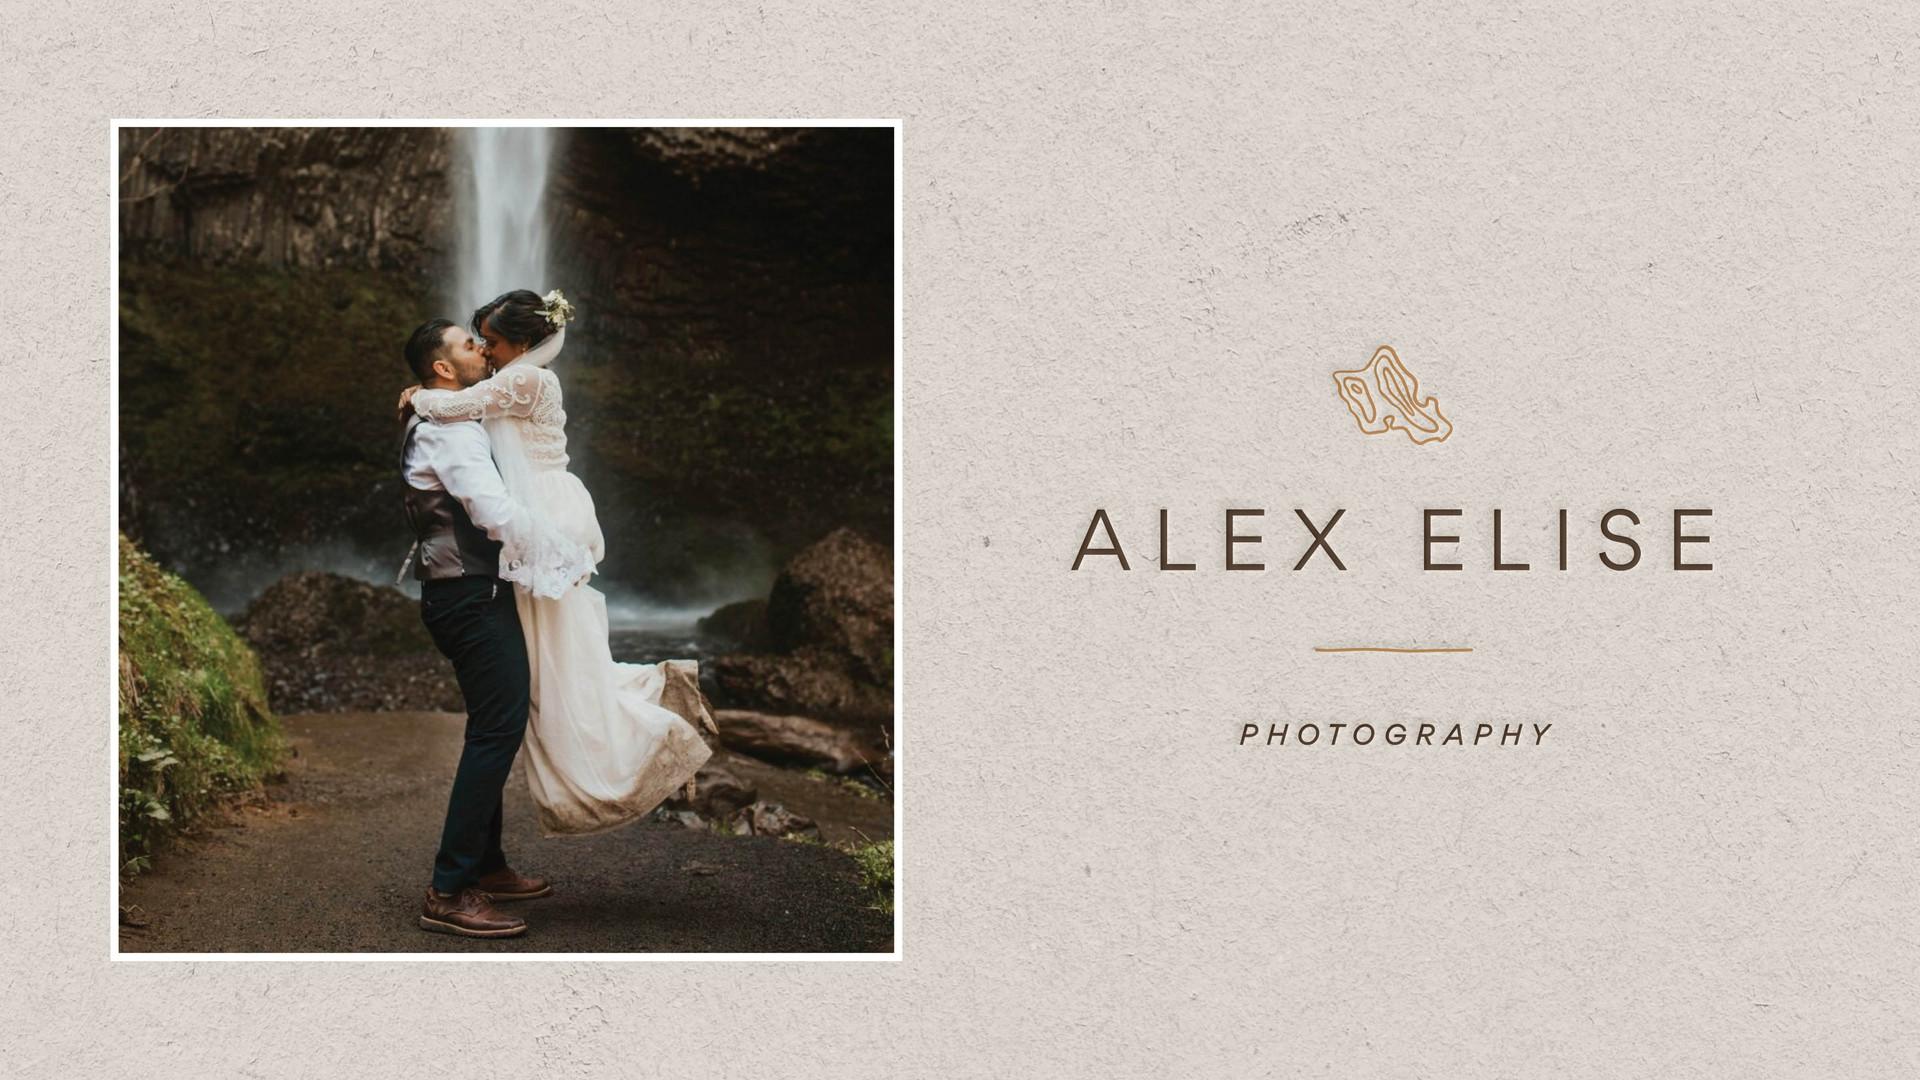 photographer branding design